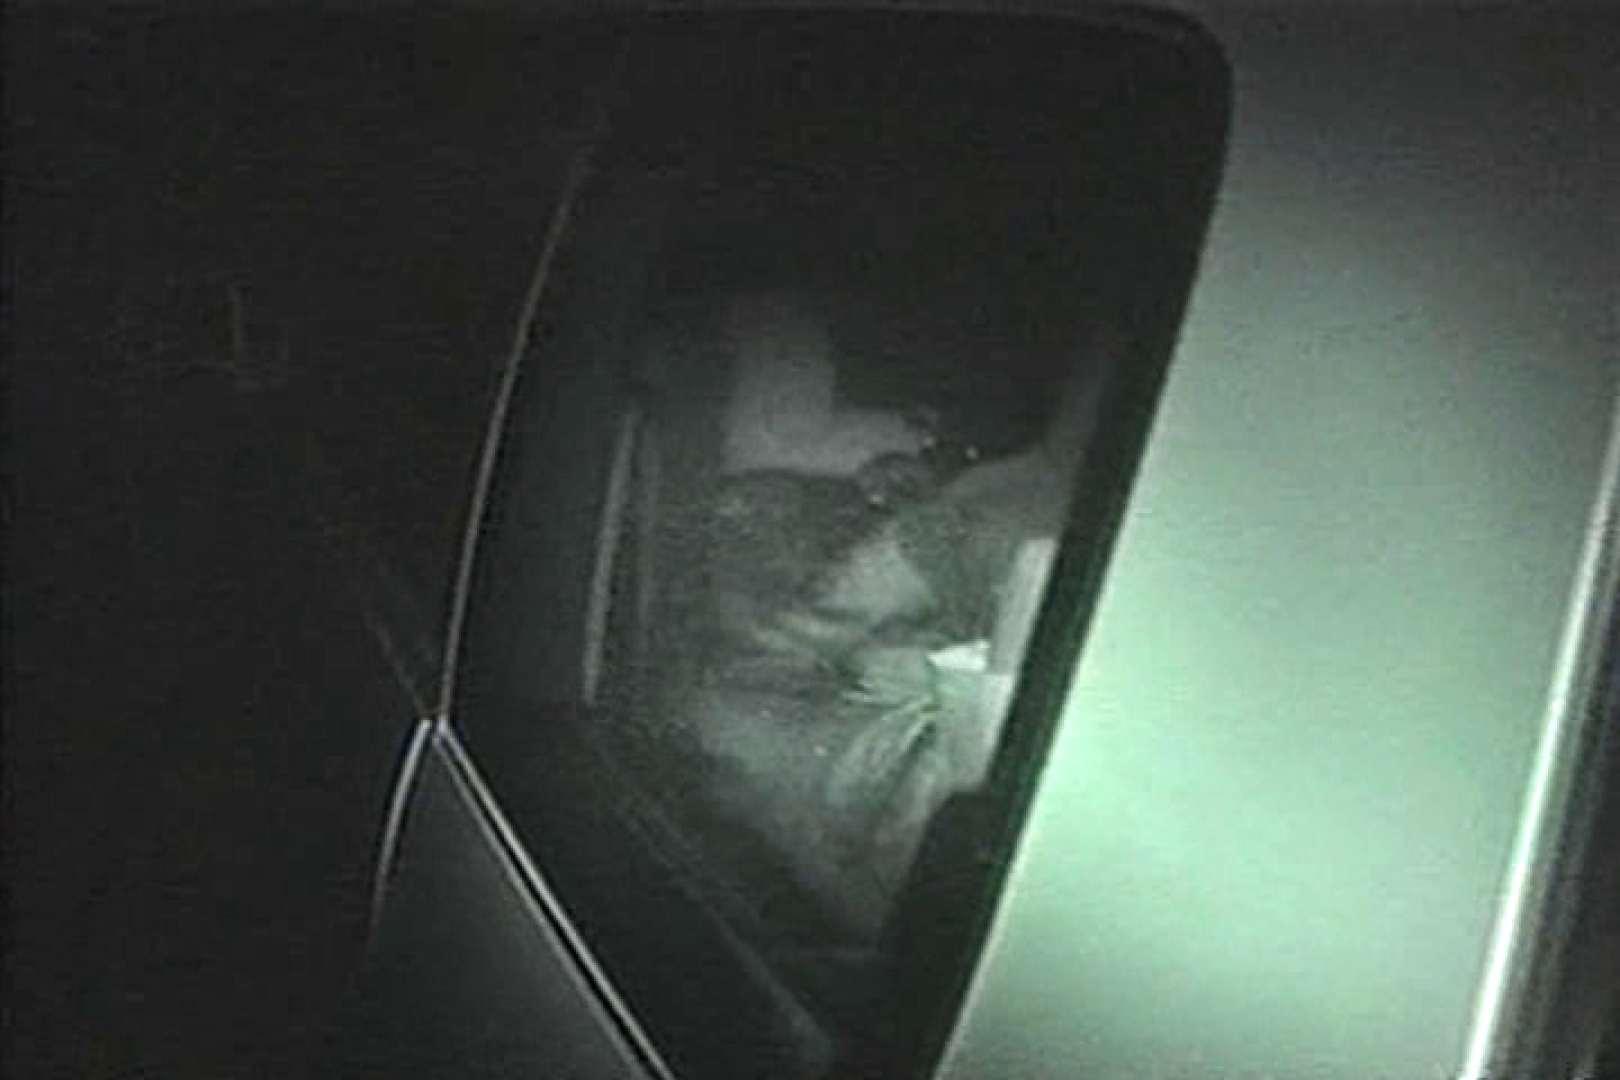 MASAさんの待ち伏せ撮り! 赤外線カーセックスVol.11 OLセックス 盗撮セックス無修正動画無料 81画像 11